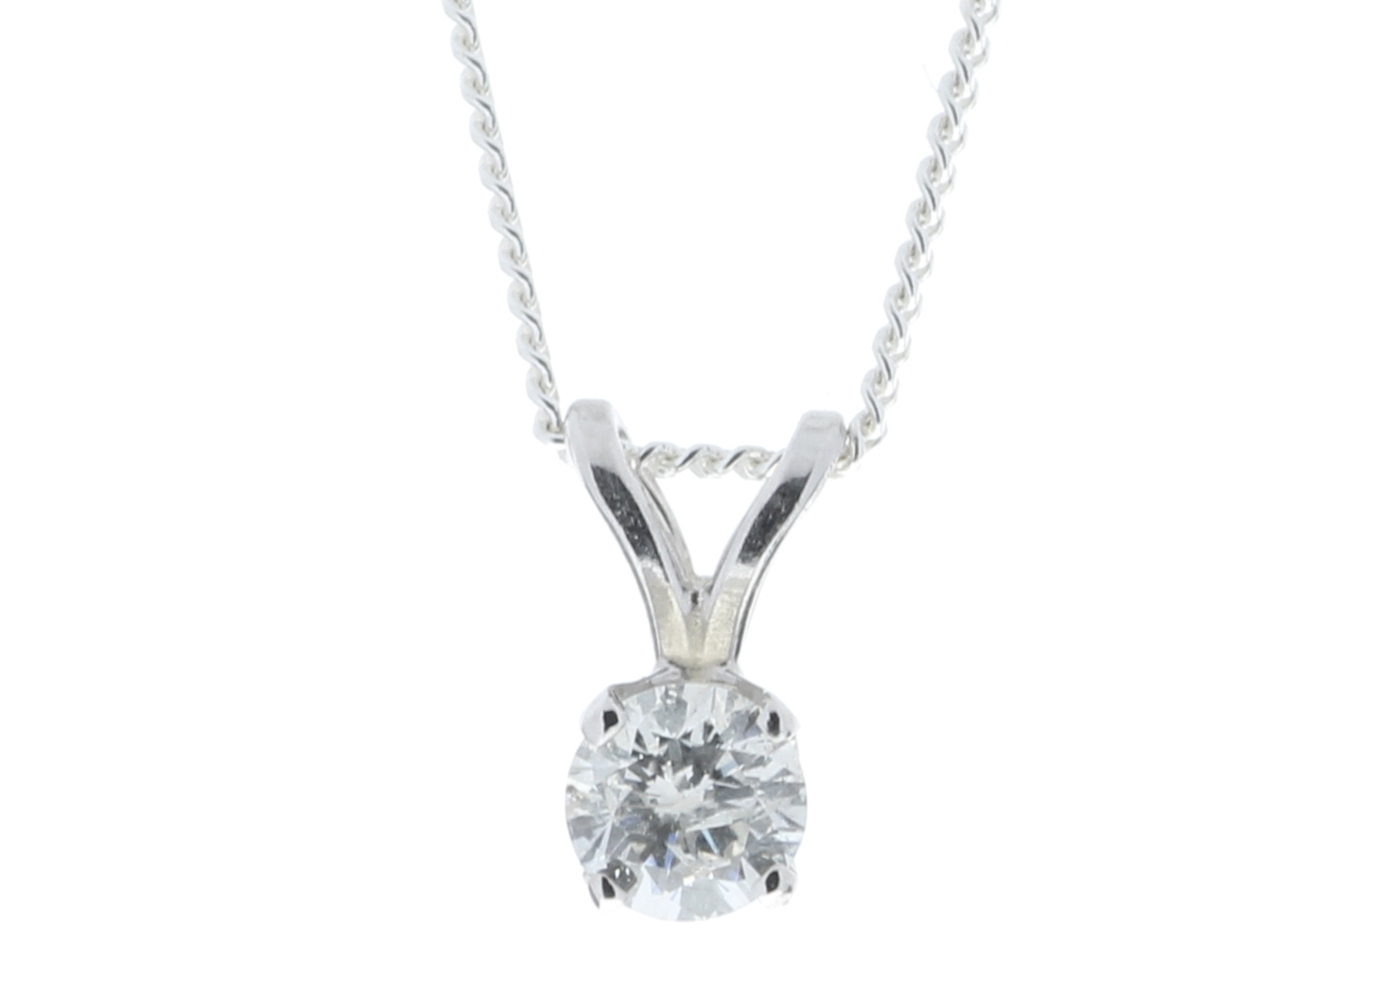 9ct White Gold Single Stone Claw Set Diamond Pendant 0.20 Carats